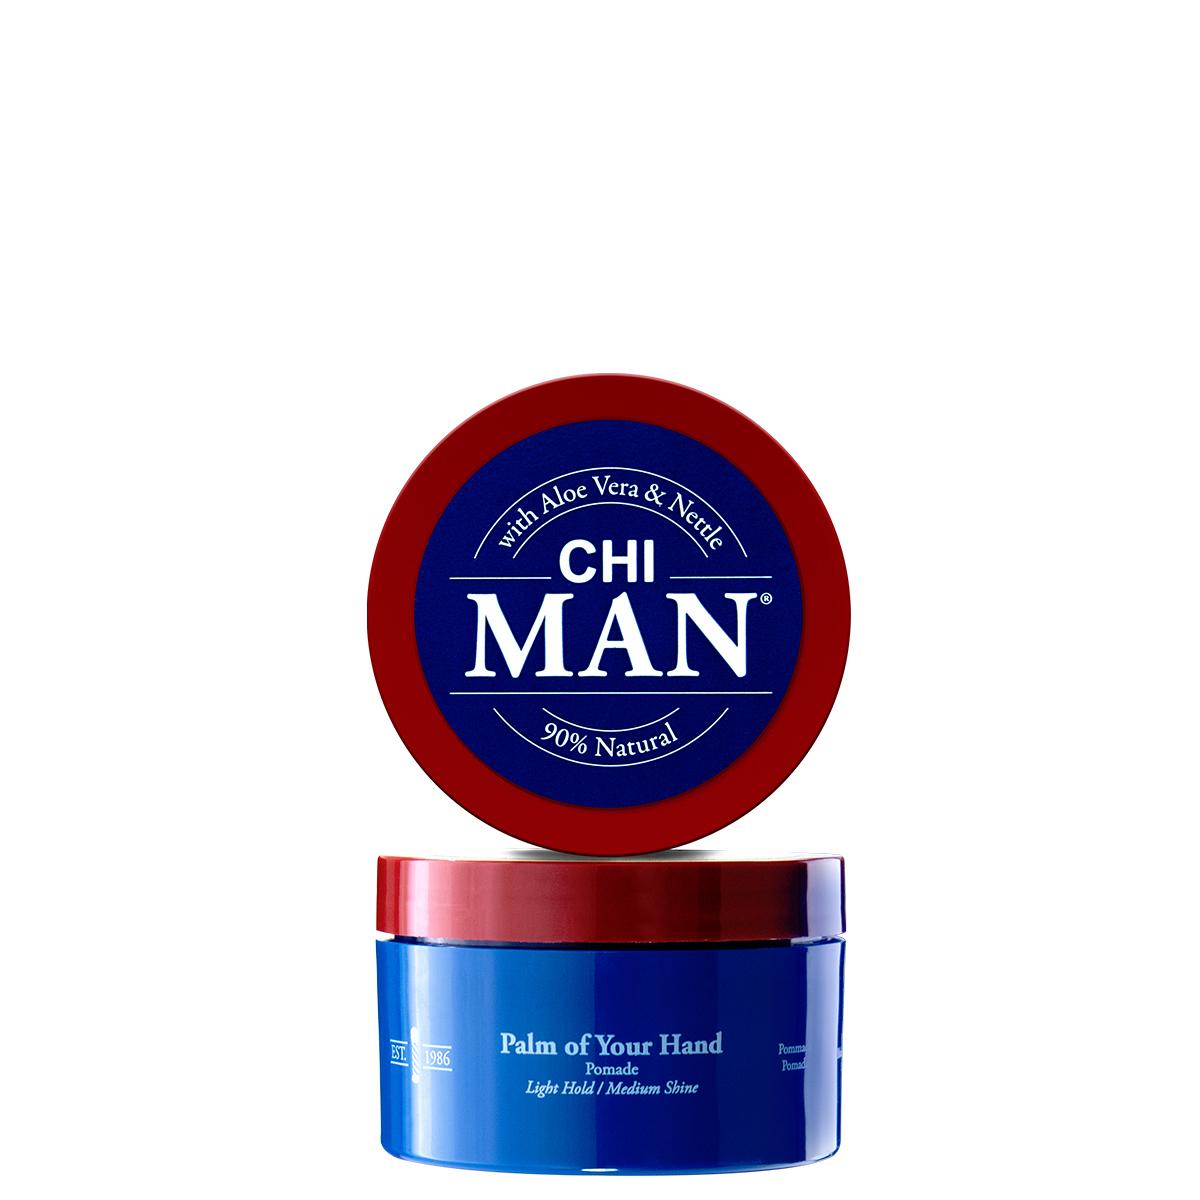 ПОМАДА ЗА КОСА С ЛЕКА ФИКСАЦИЯ CHI Man Palm of Your Hand Pomade 89ml